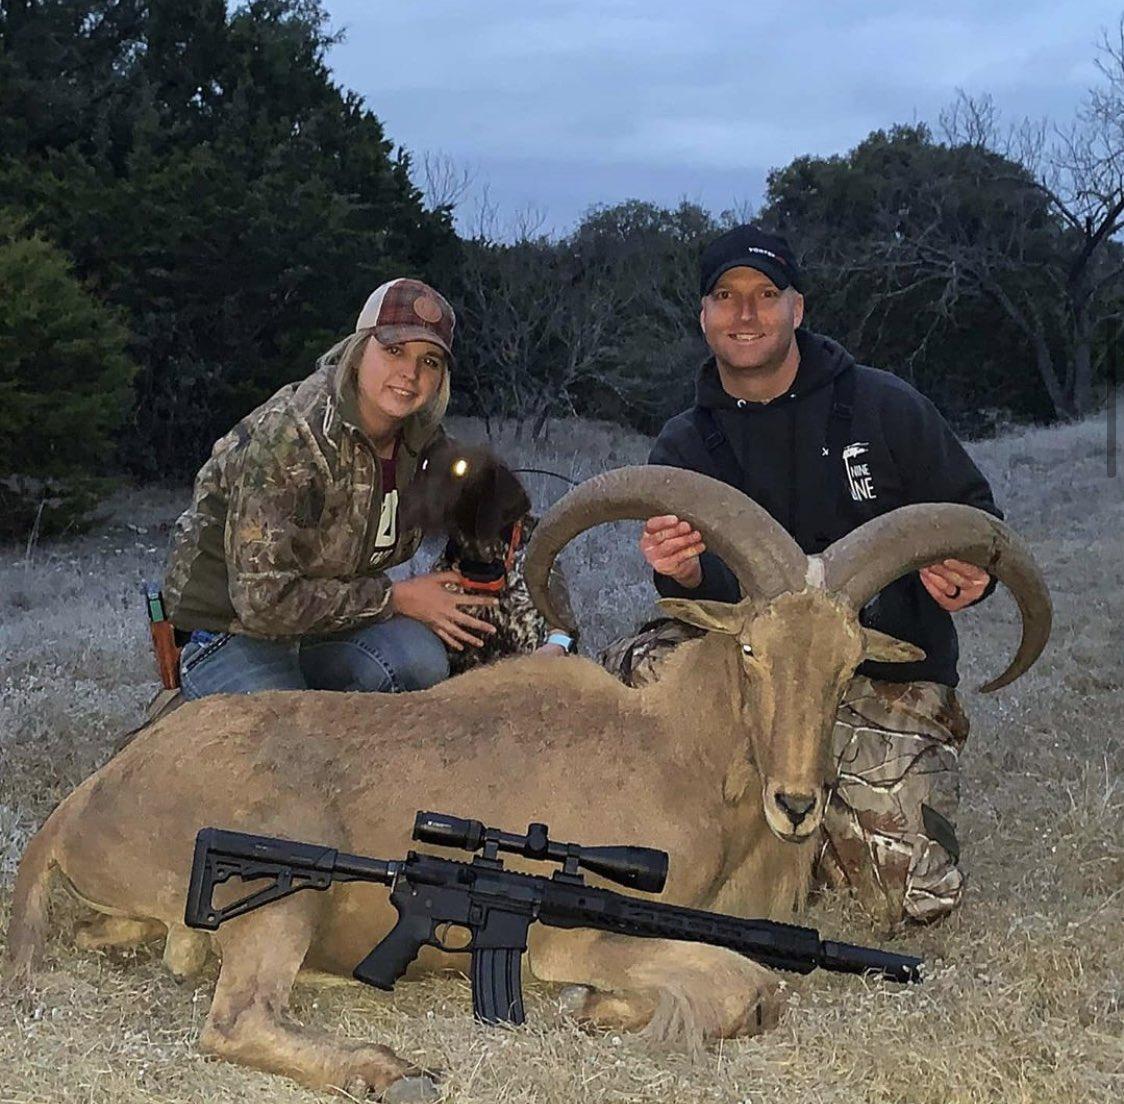 A versatile dog makes a good a GREAT dog.  Case in point- 📸 @outbackgspvomhinterlandkennels #gsp #germanshorthairedpointer #aoudad #aoudadhunting #huntingtexas #biggame #hunting #trackingdog #huntingdog #birddog #gundog #bigram #texas #texashunting #wingshooting #westtexas